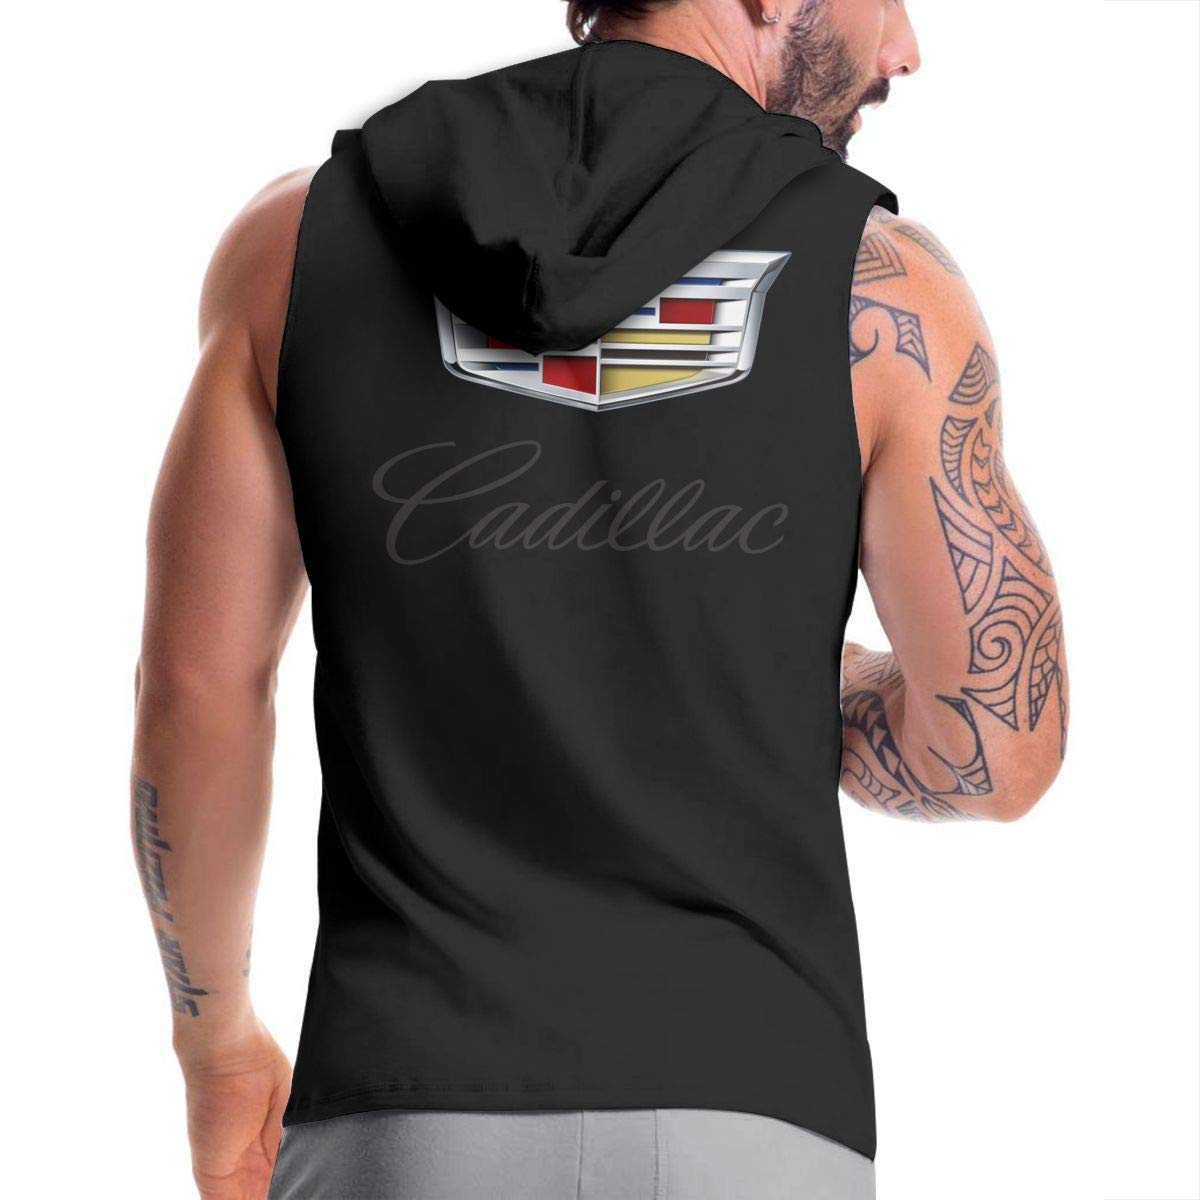 SHENGN Man Custom Casual with Hood Bag Cadillac 2014 Colorful Logo Zipper Sweater